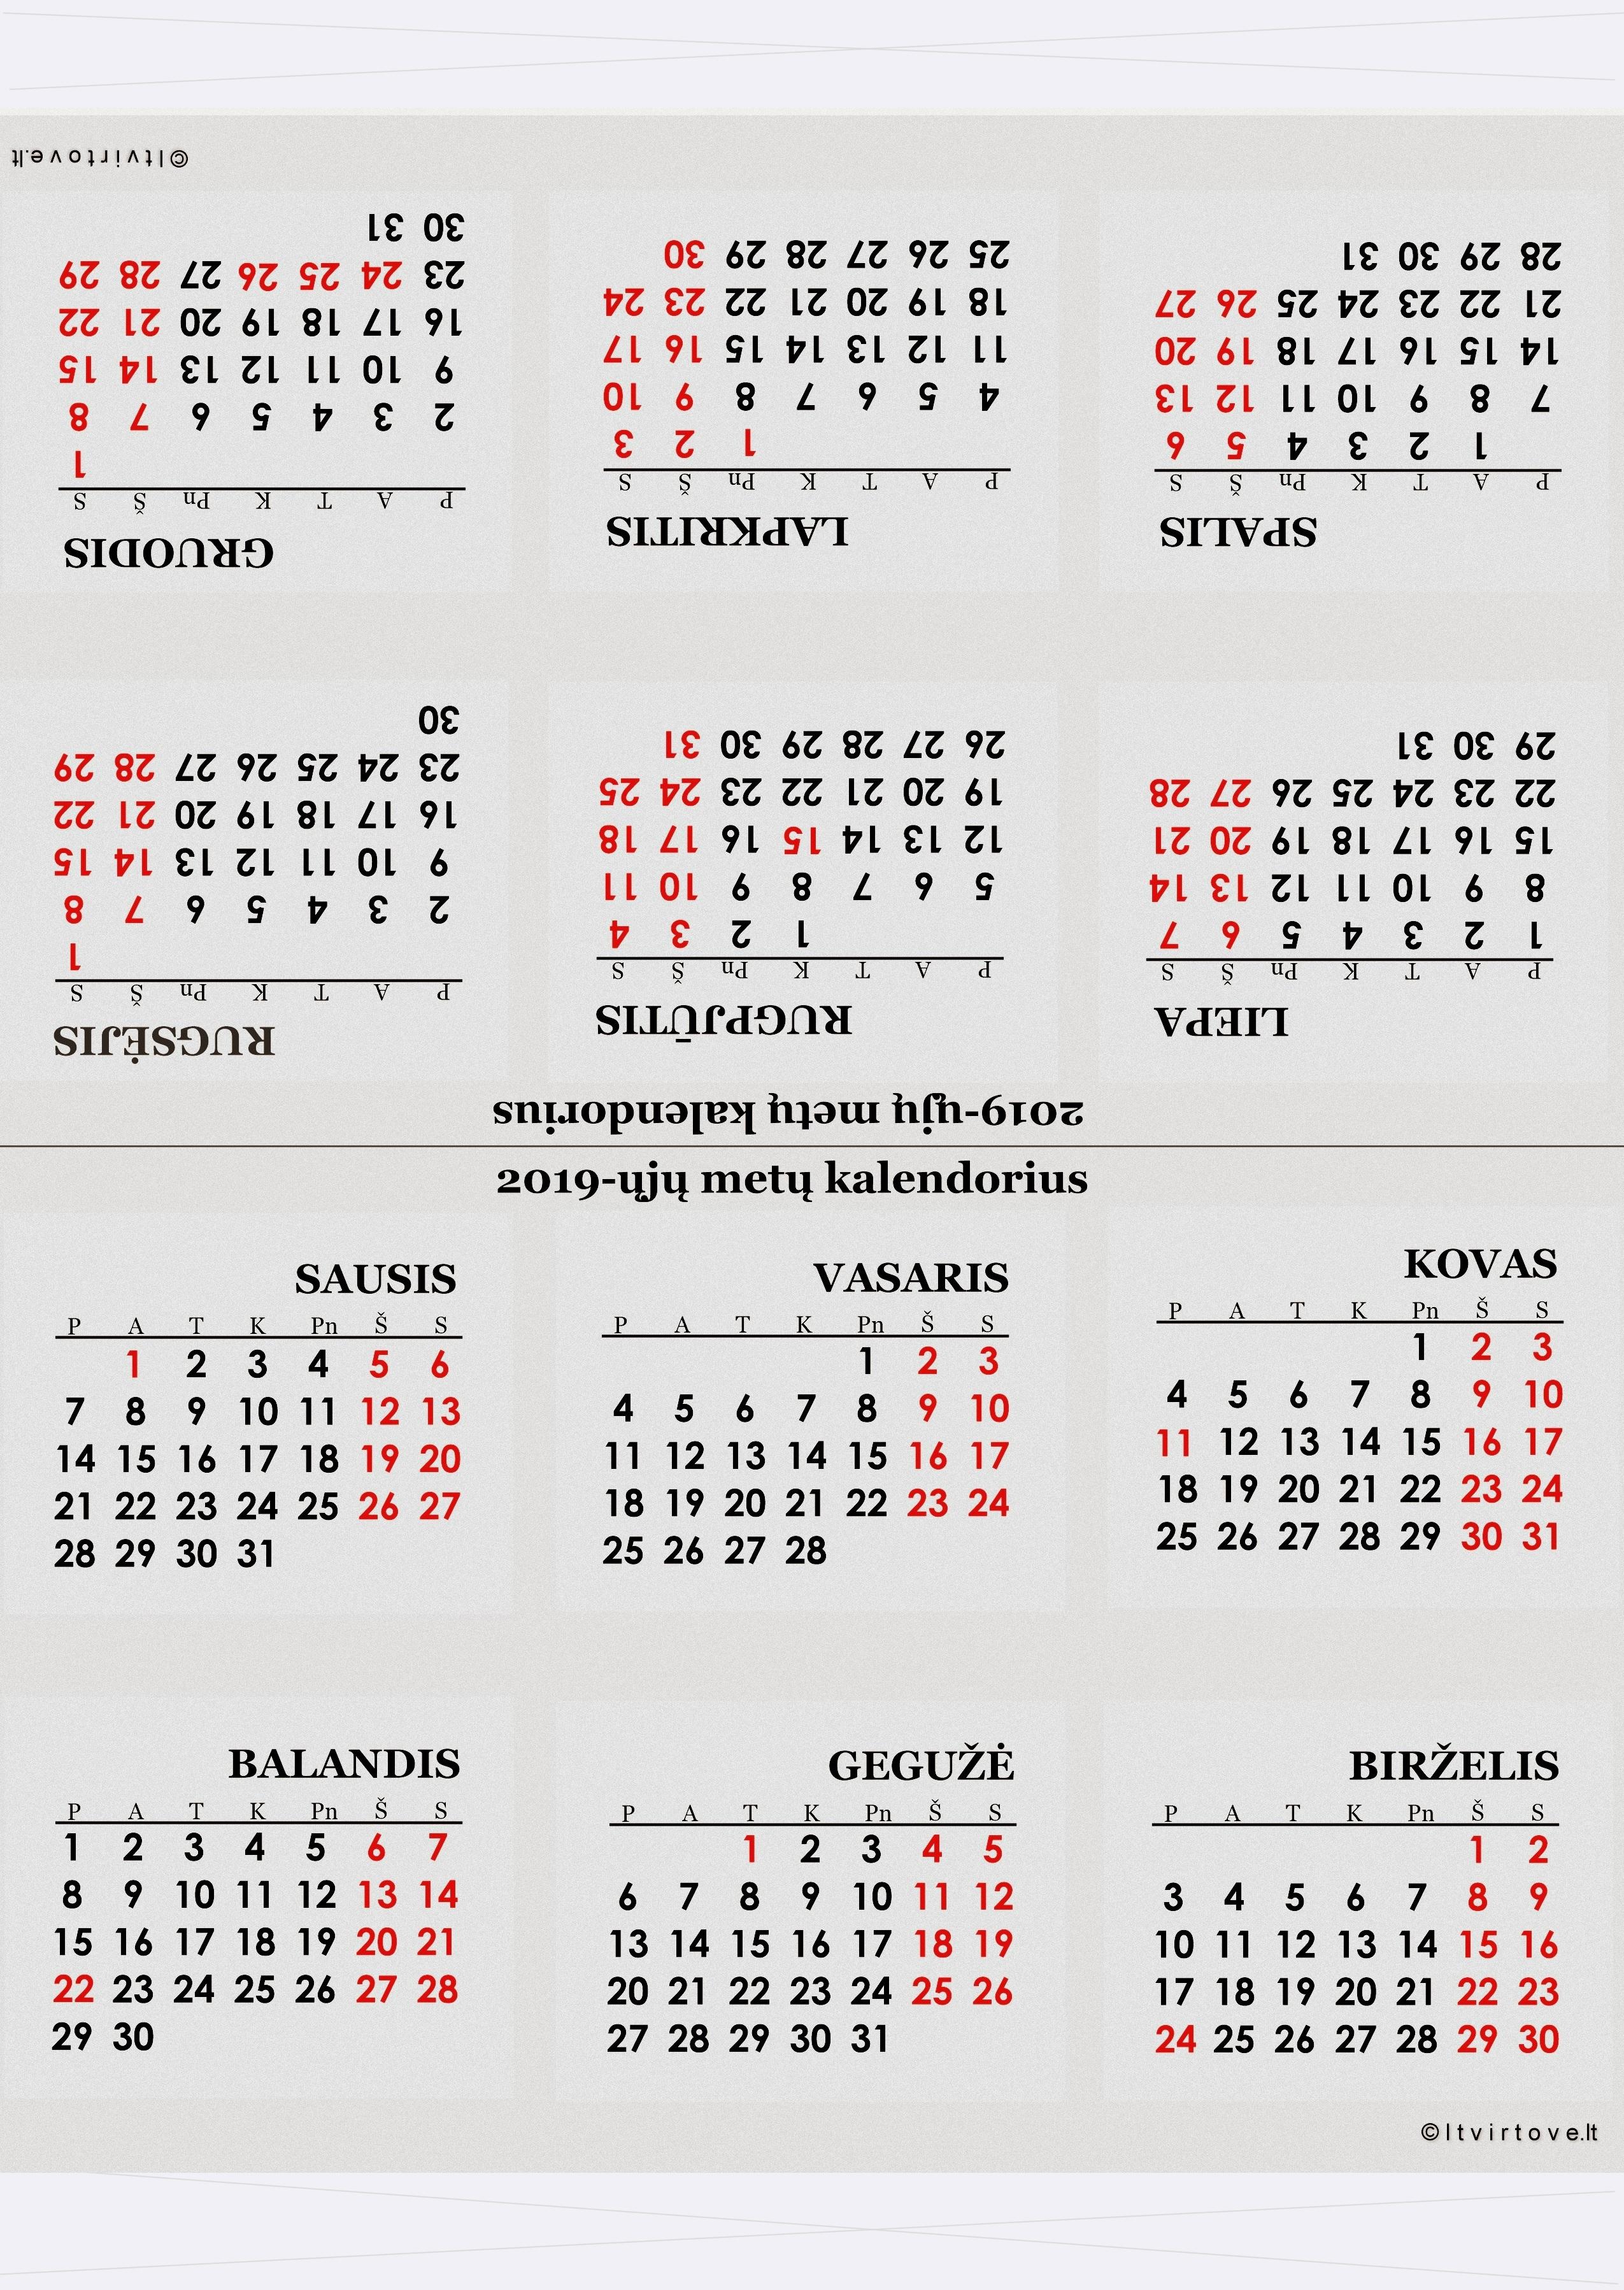 2020 Kalendorius Su Savaitemis.Kalendoriai 2019 Iesiems Metams Trikampio Formos